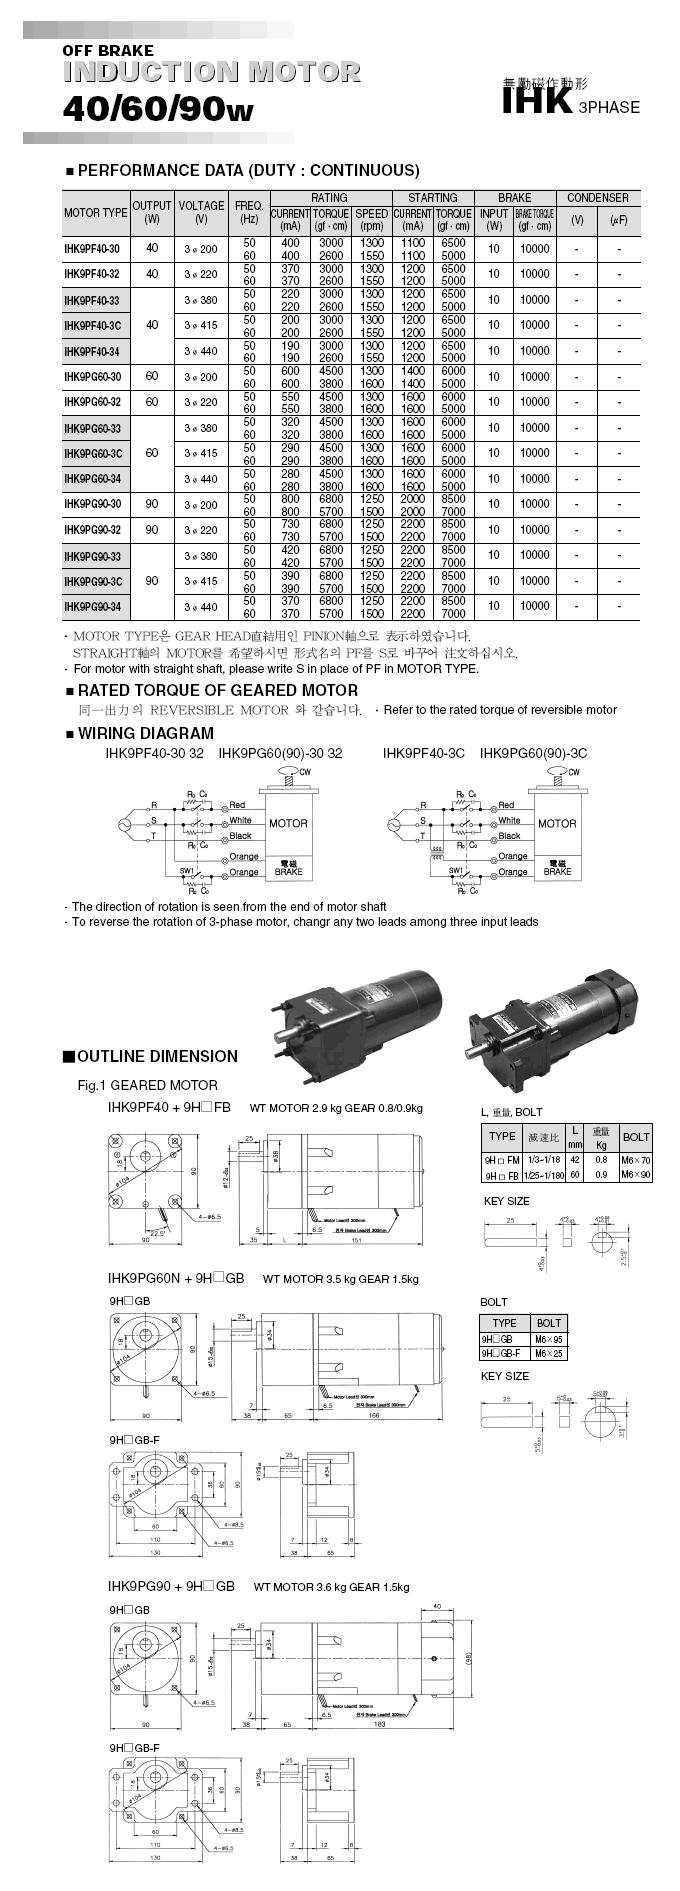 Woojin Servo Brake Motor HK-Series 4